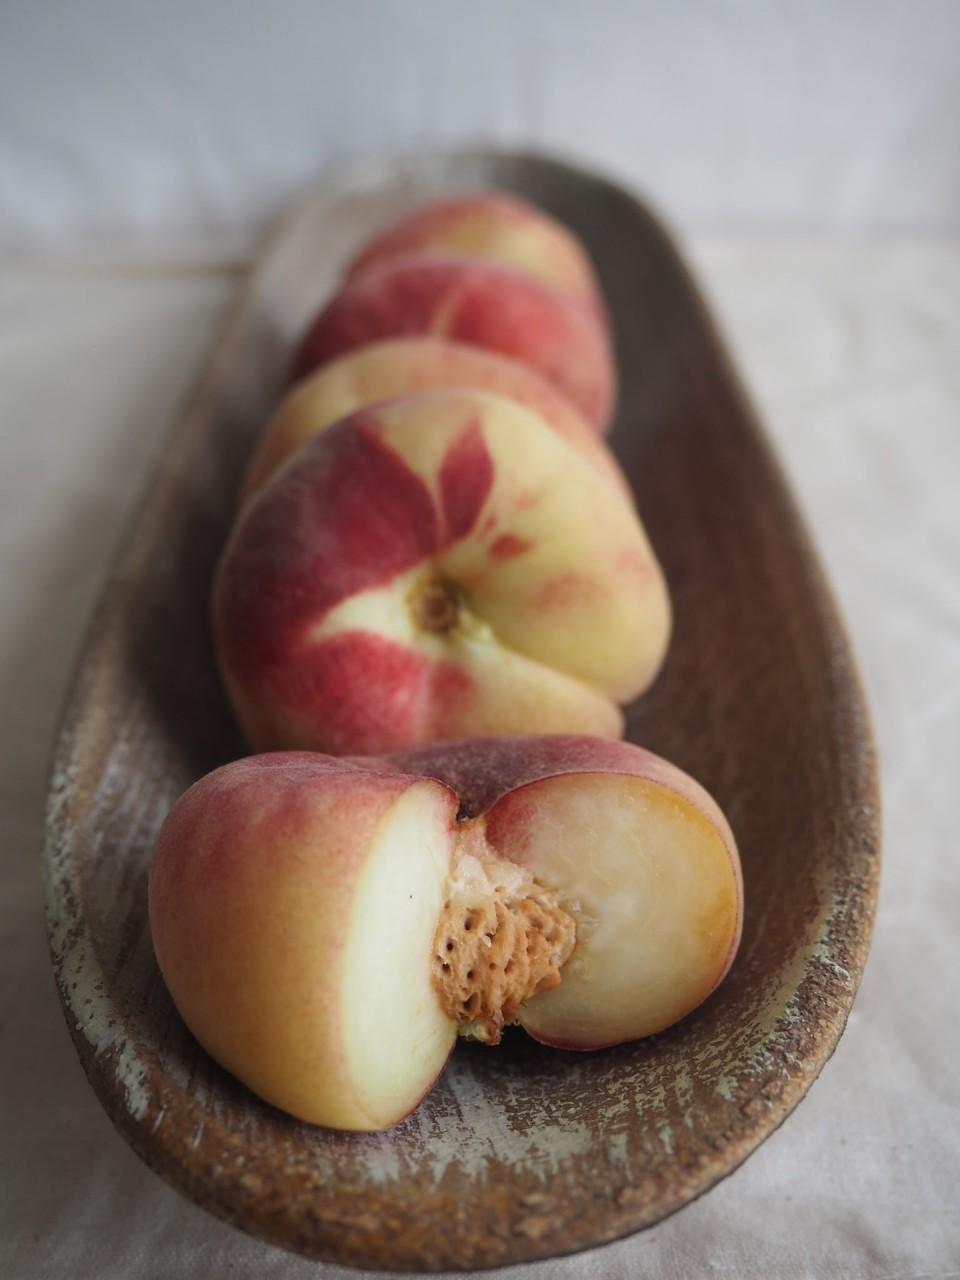 fruit-2630061_1920